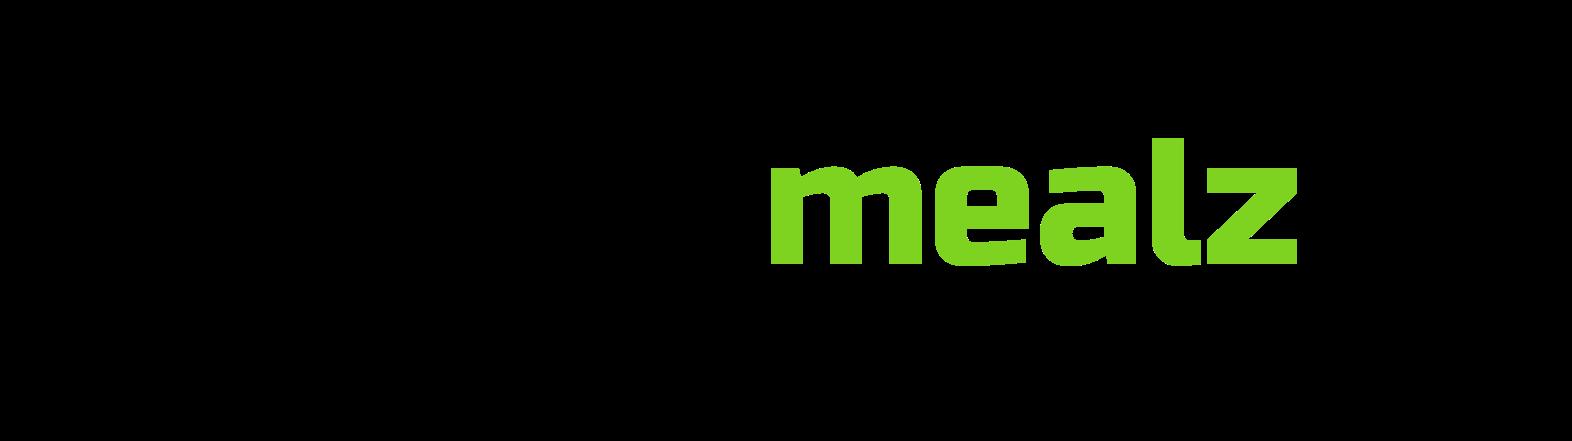 ordermealz logo